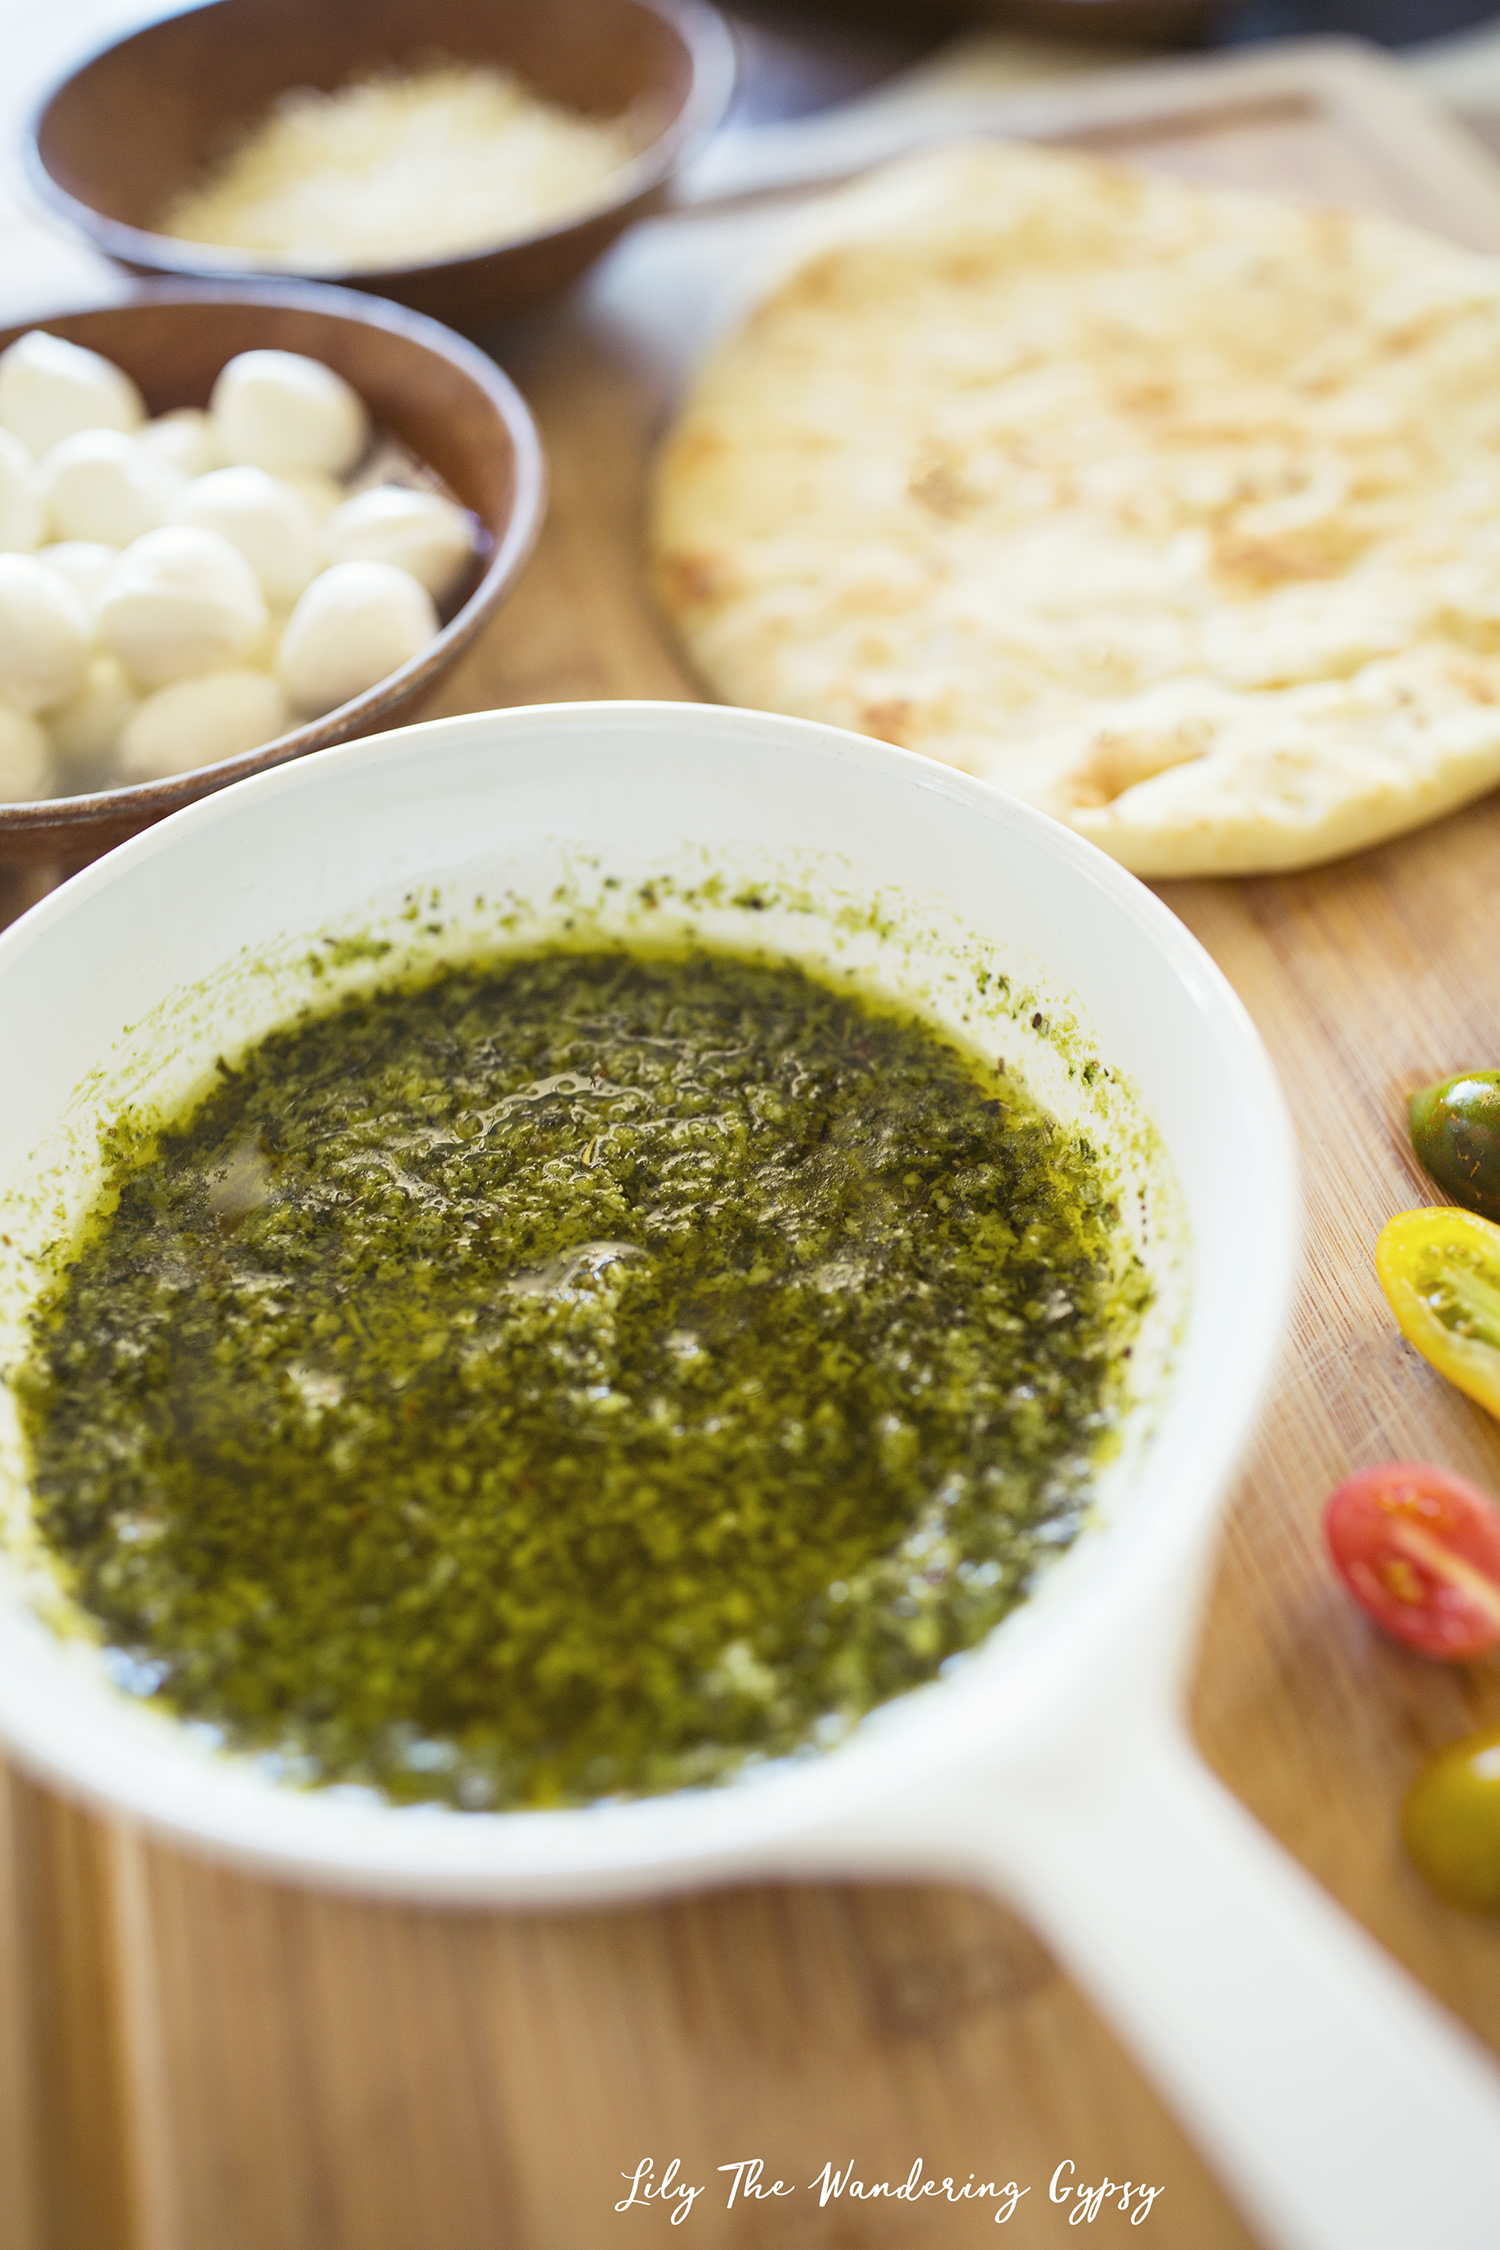 #ElevateYourPlate with this Vegetarian Flatbread Pizza Recipe